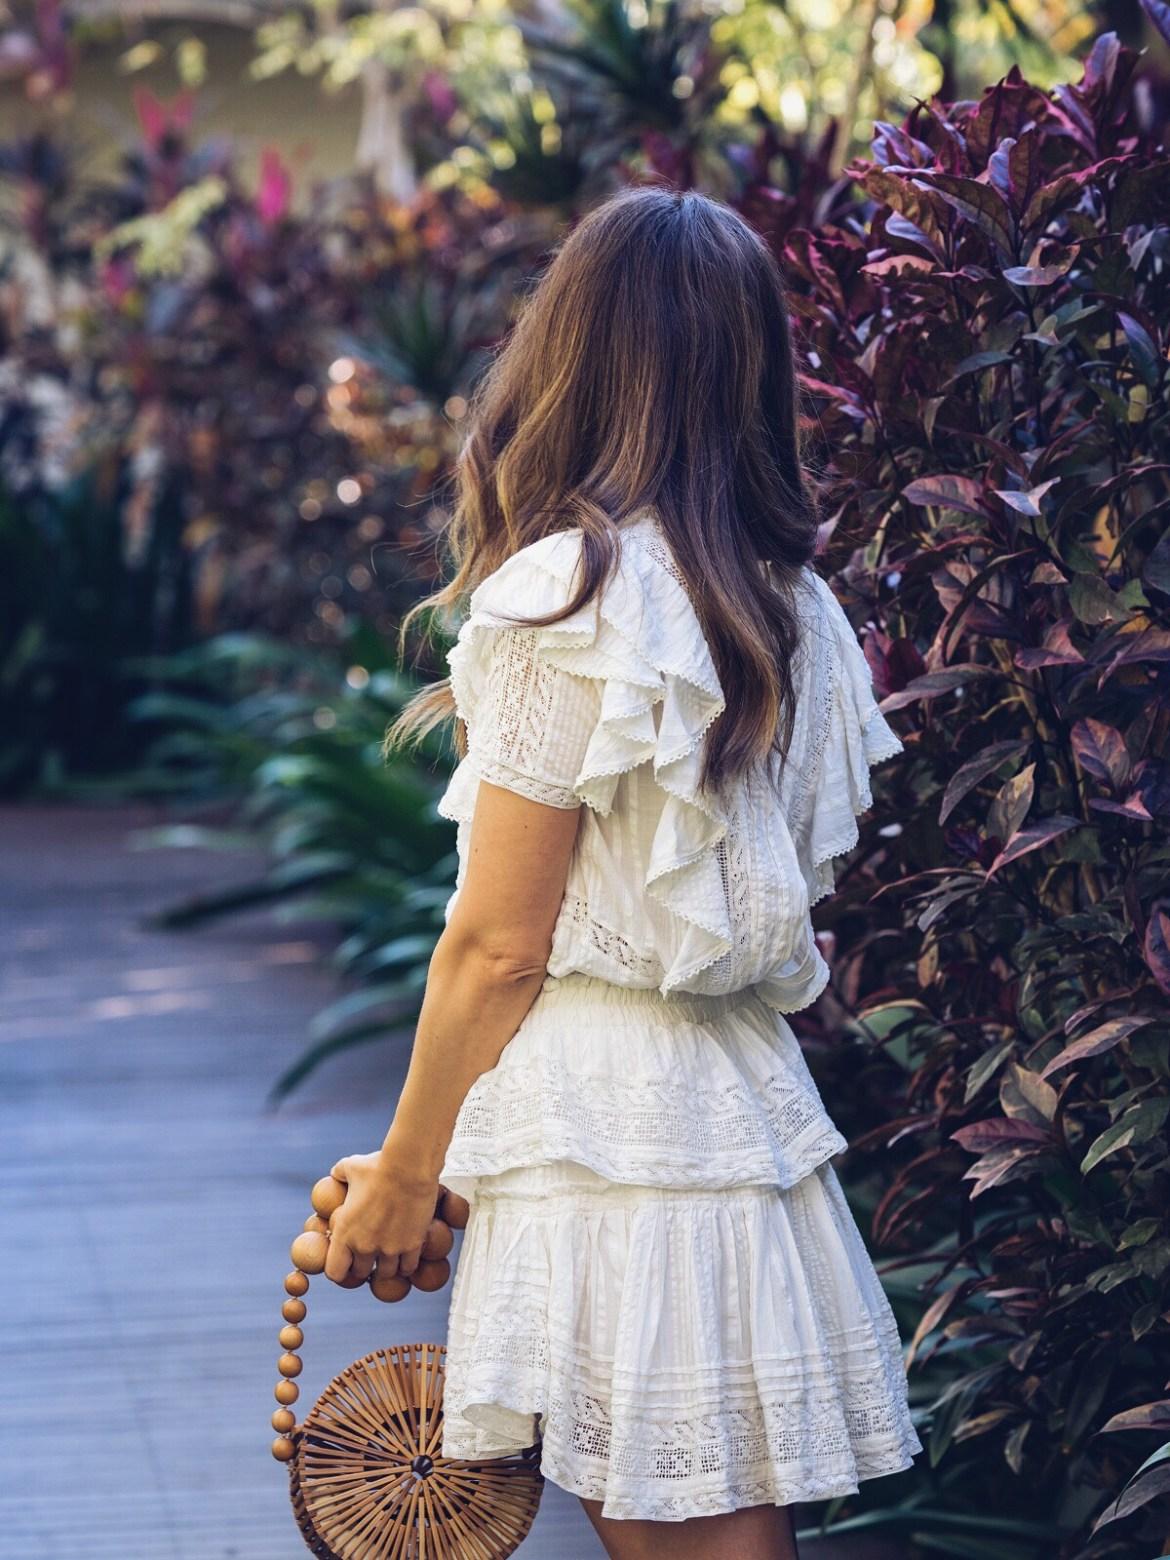 LOVESHACKFANCY little white summer dresses edit with Cult Gaia round bag Inspiring Wit blogger Jenelle